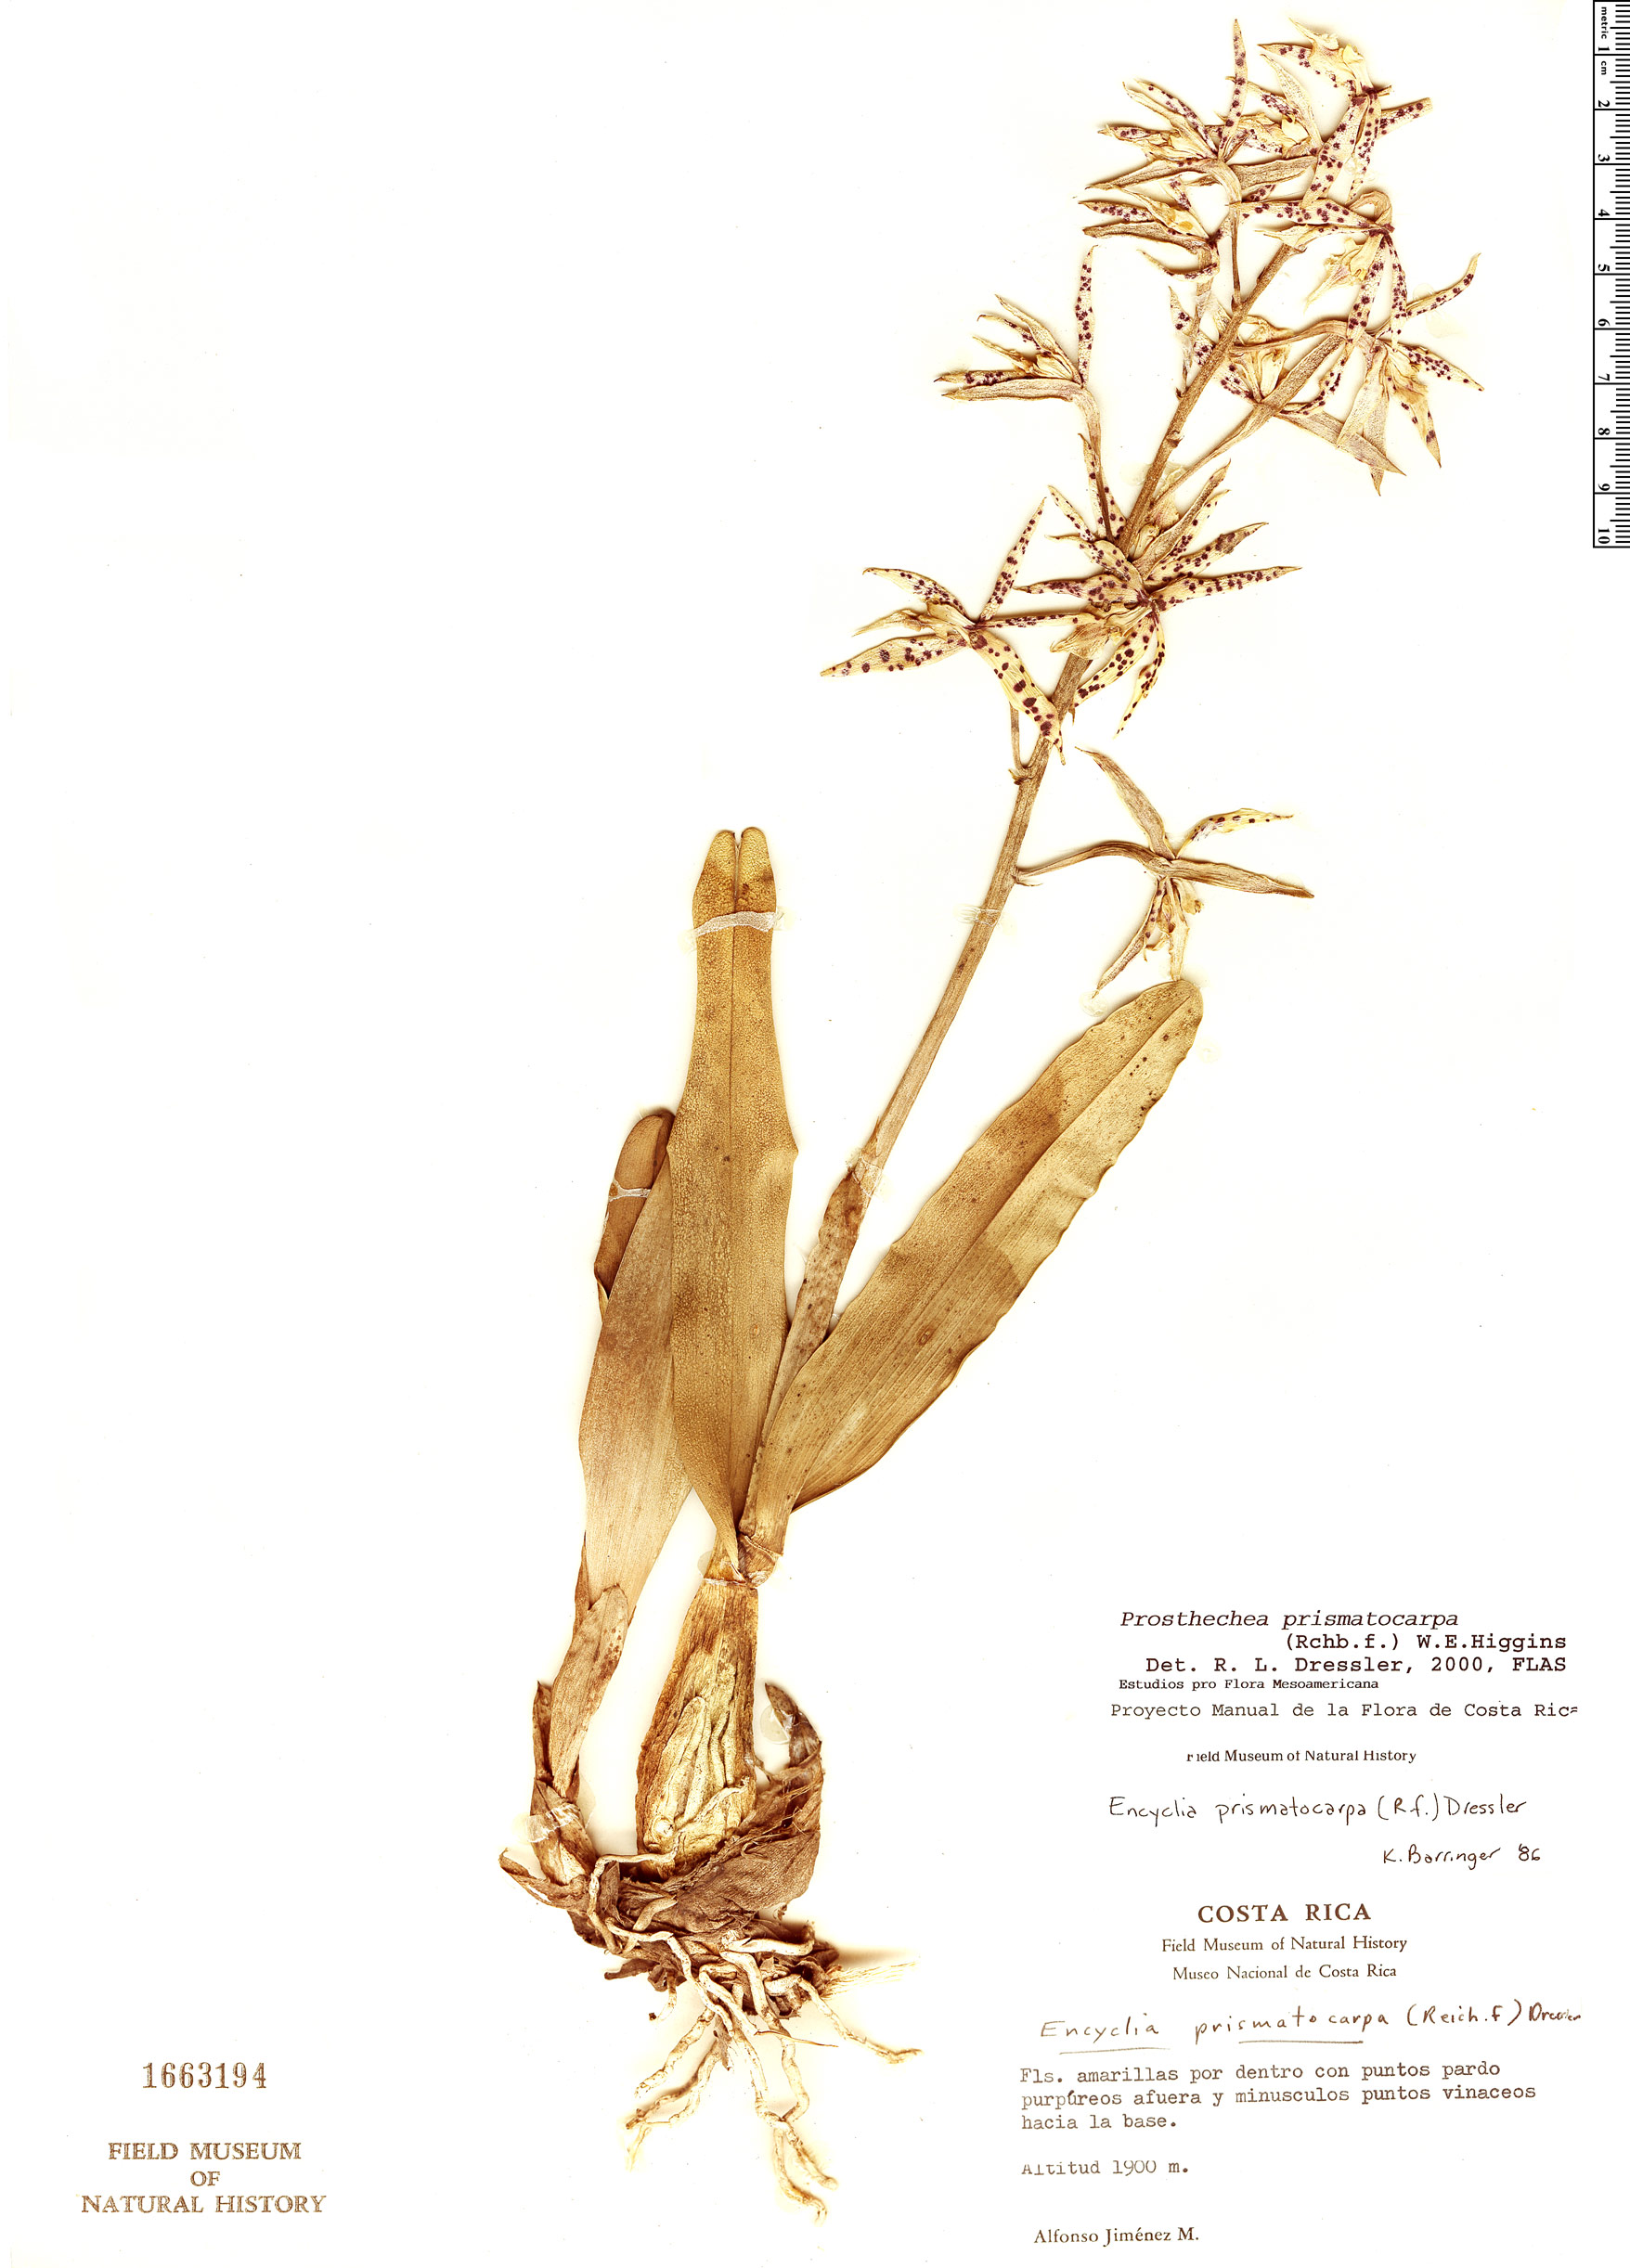 Specimen: Prosthechea prismatocarpa